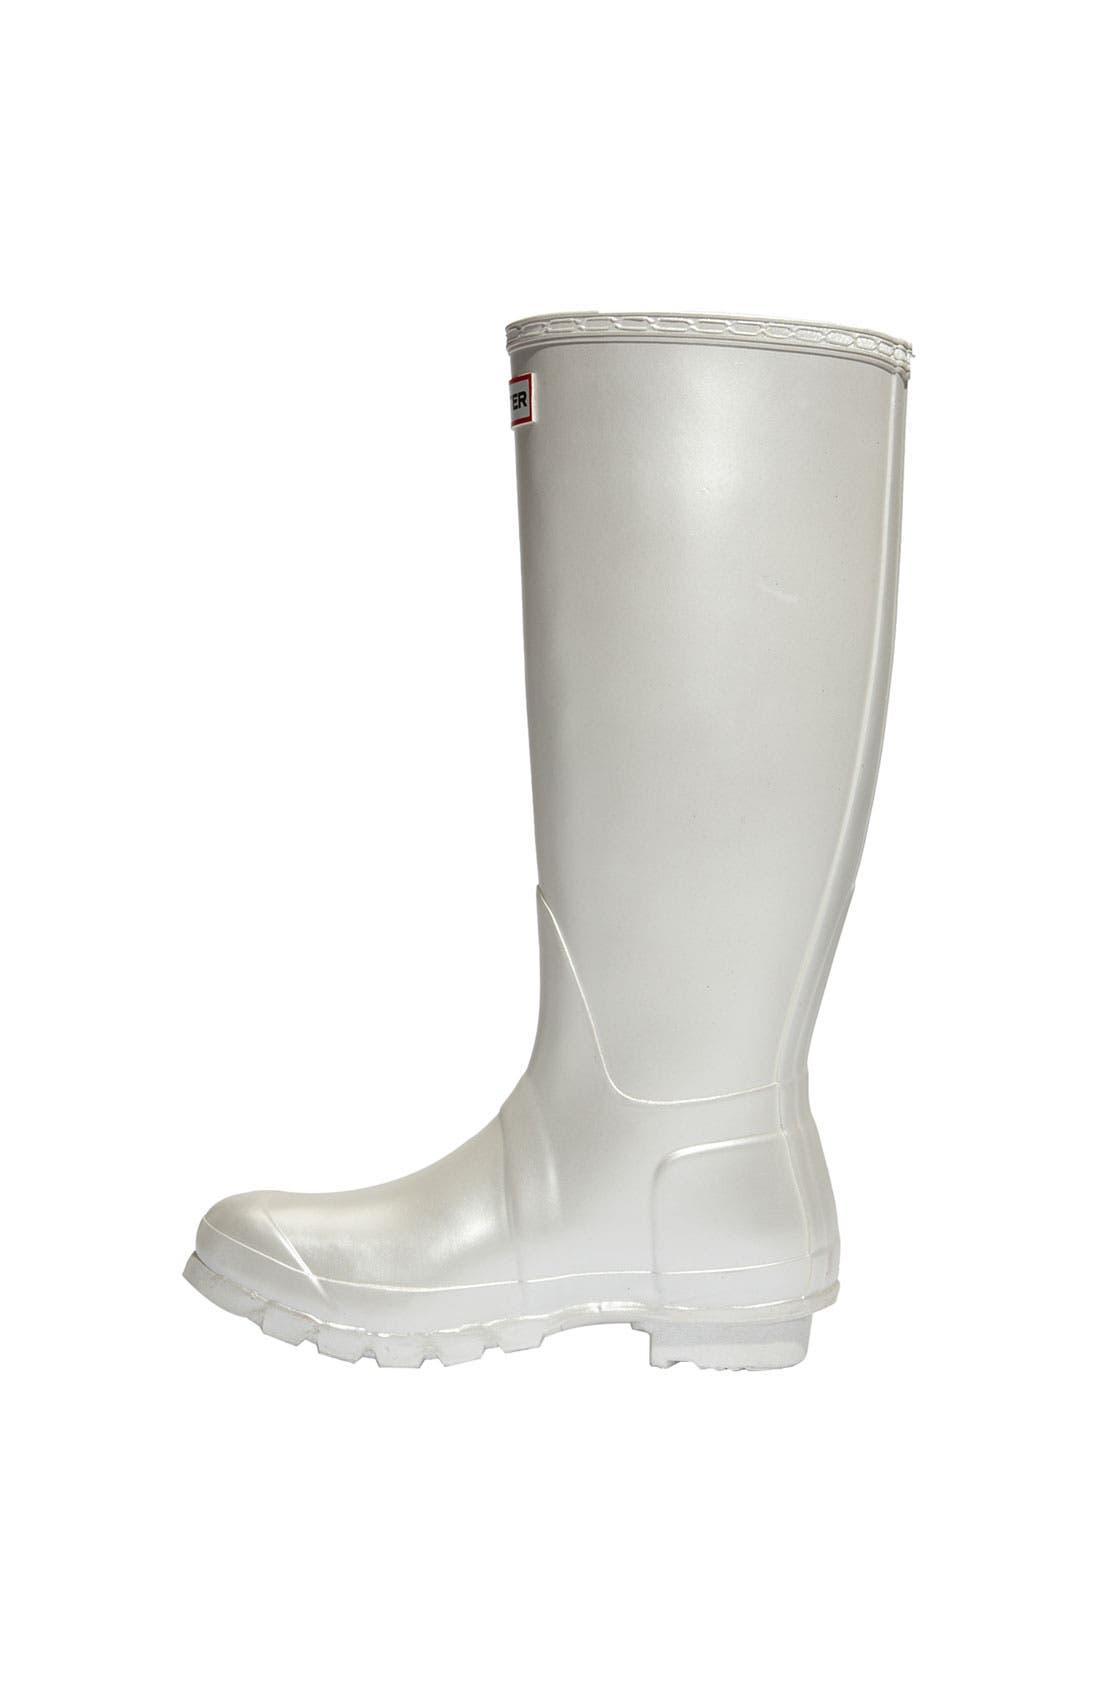 Alternate Image 2  - Hunter 'Original Tall' Metallic Rain Boot (Women)